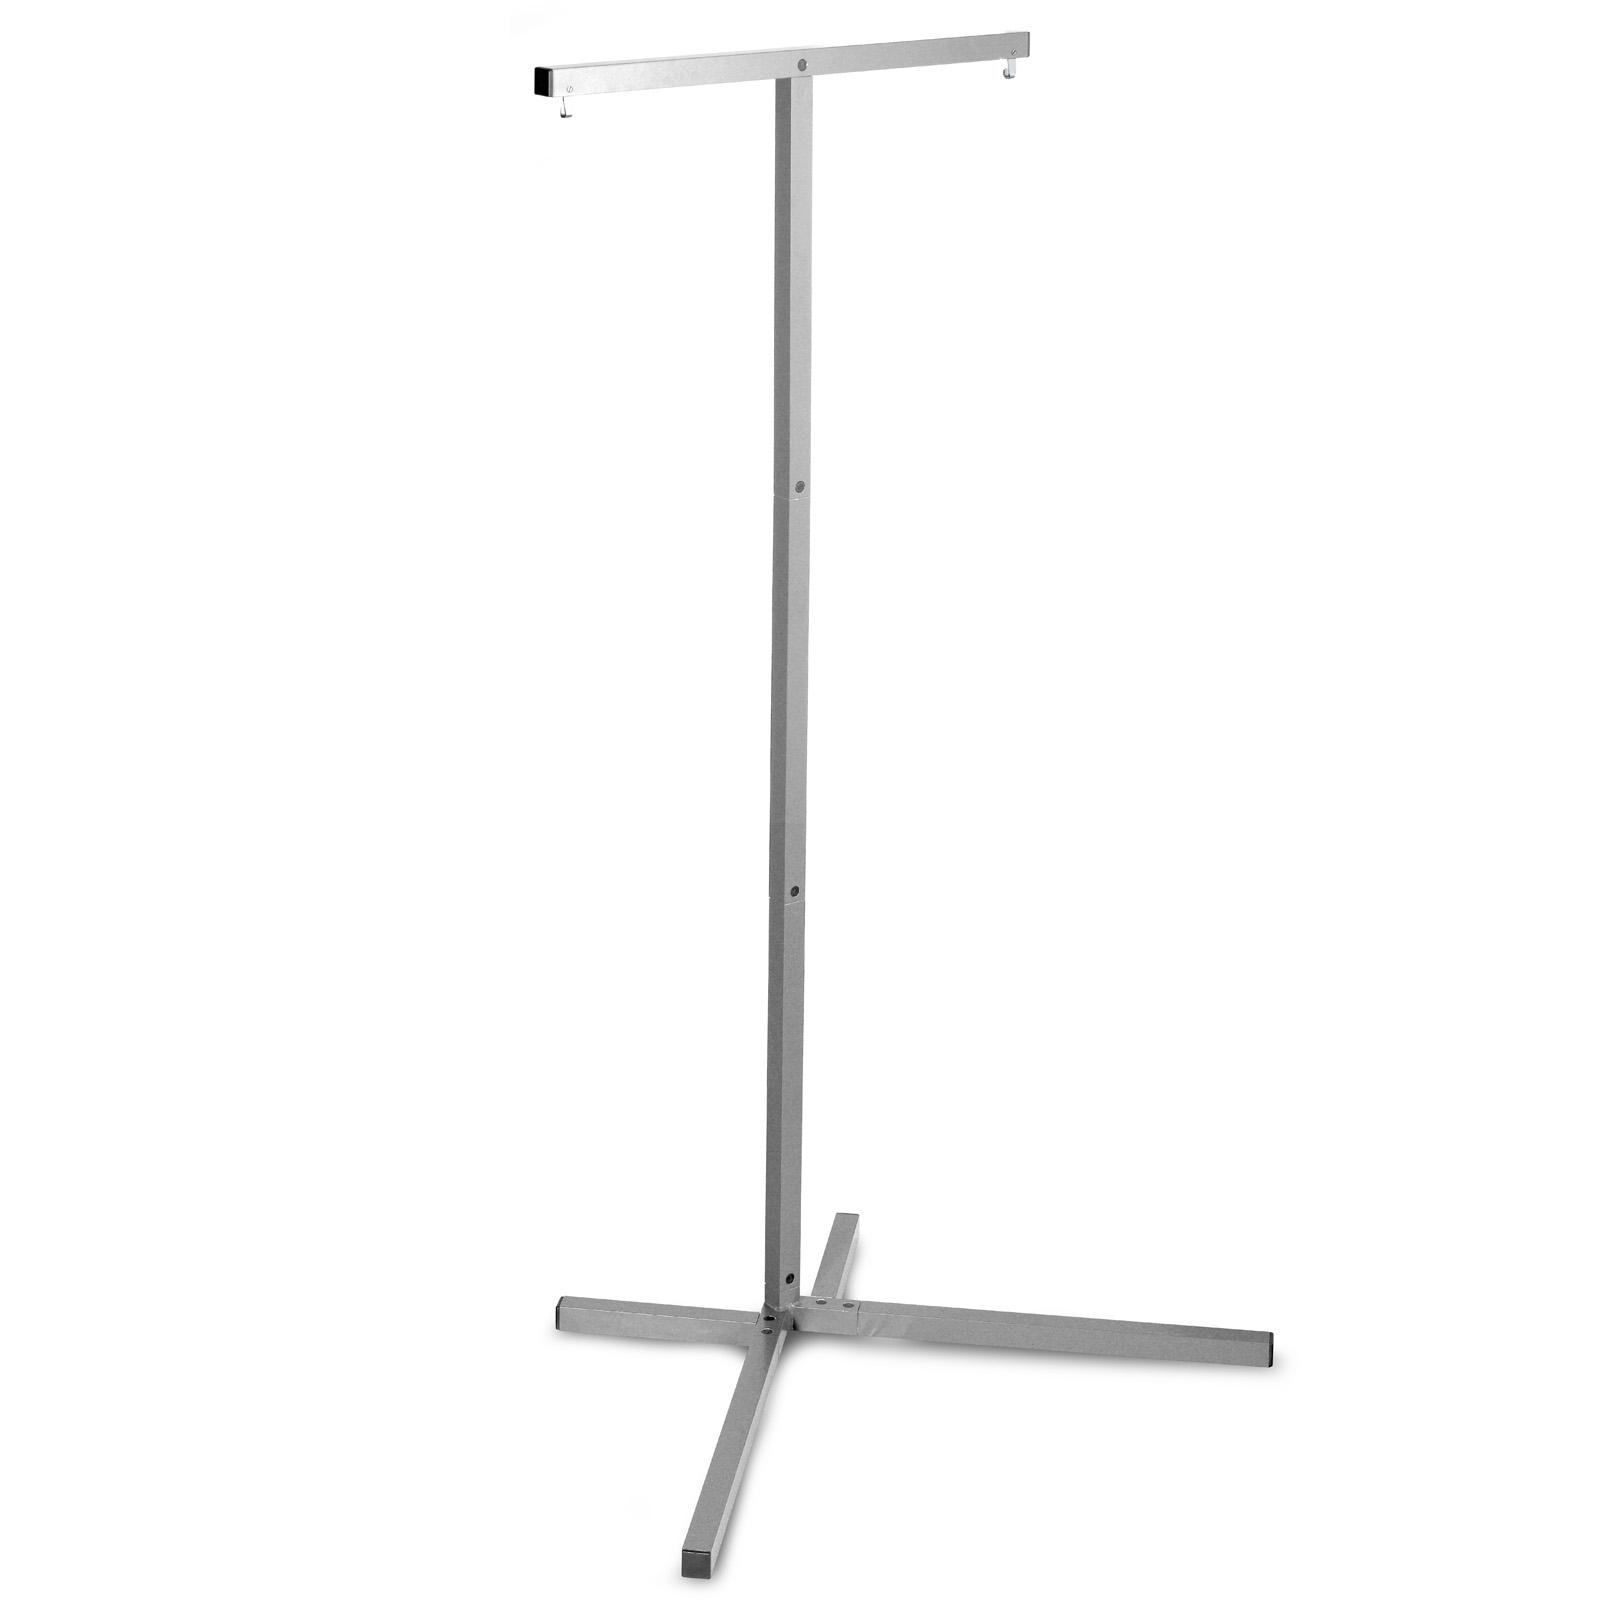 Pax POM stand